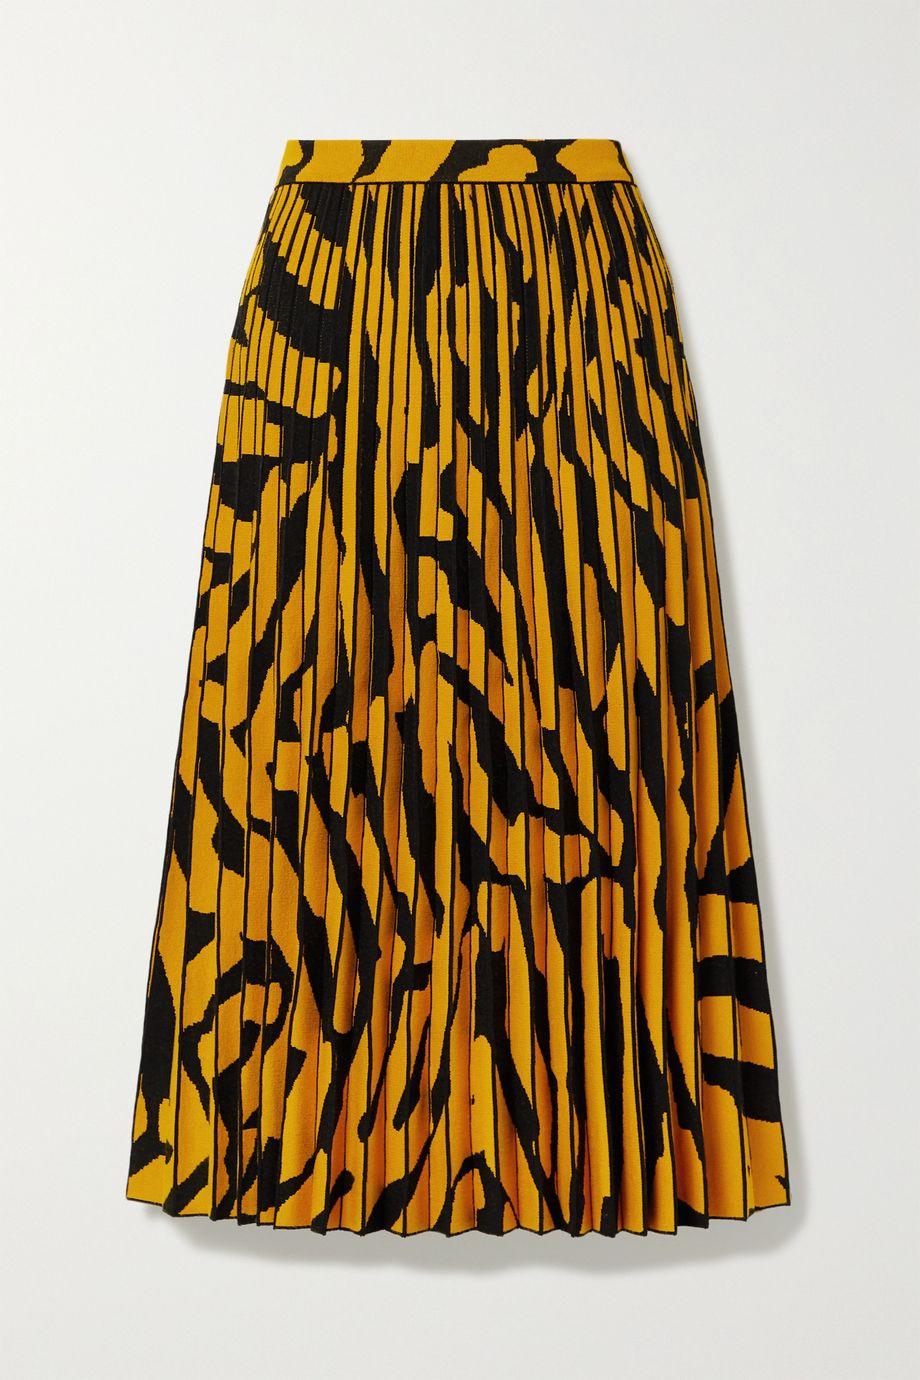 Proenza Schouler Pleated stretch jacquard-knit midi skirt